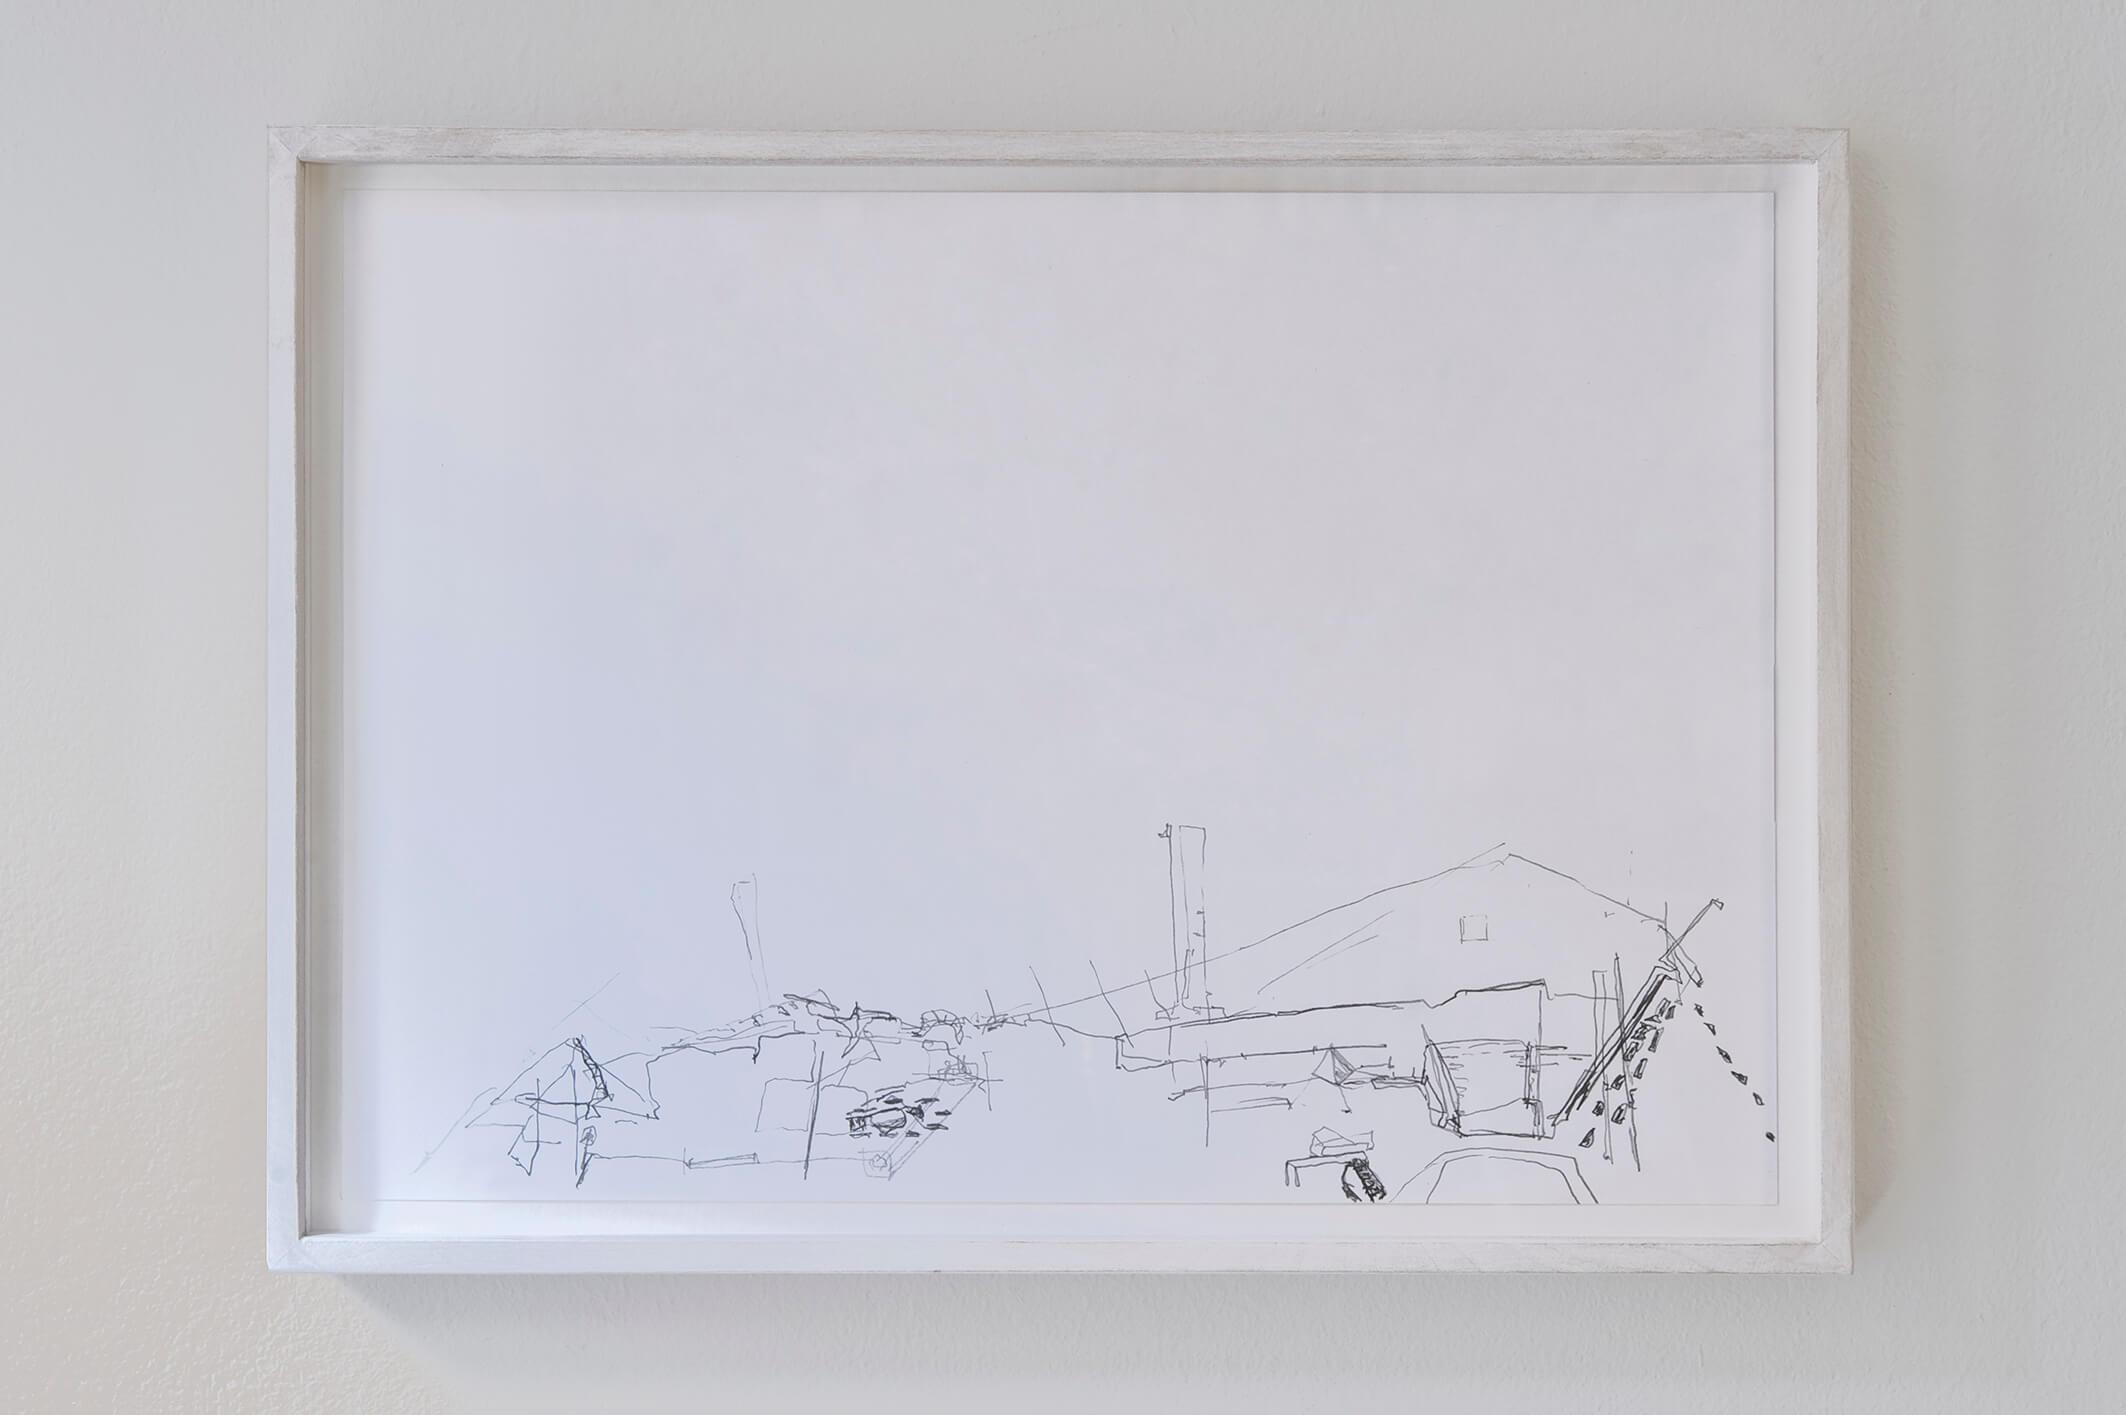 Ungenutzte flächen (Useless planes), 2011 | Immer Noch Sturm | ProjecteSD